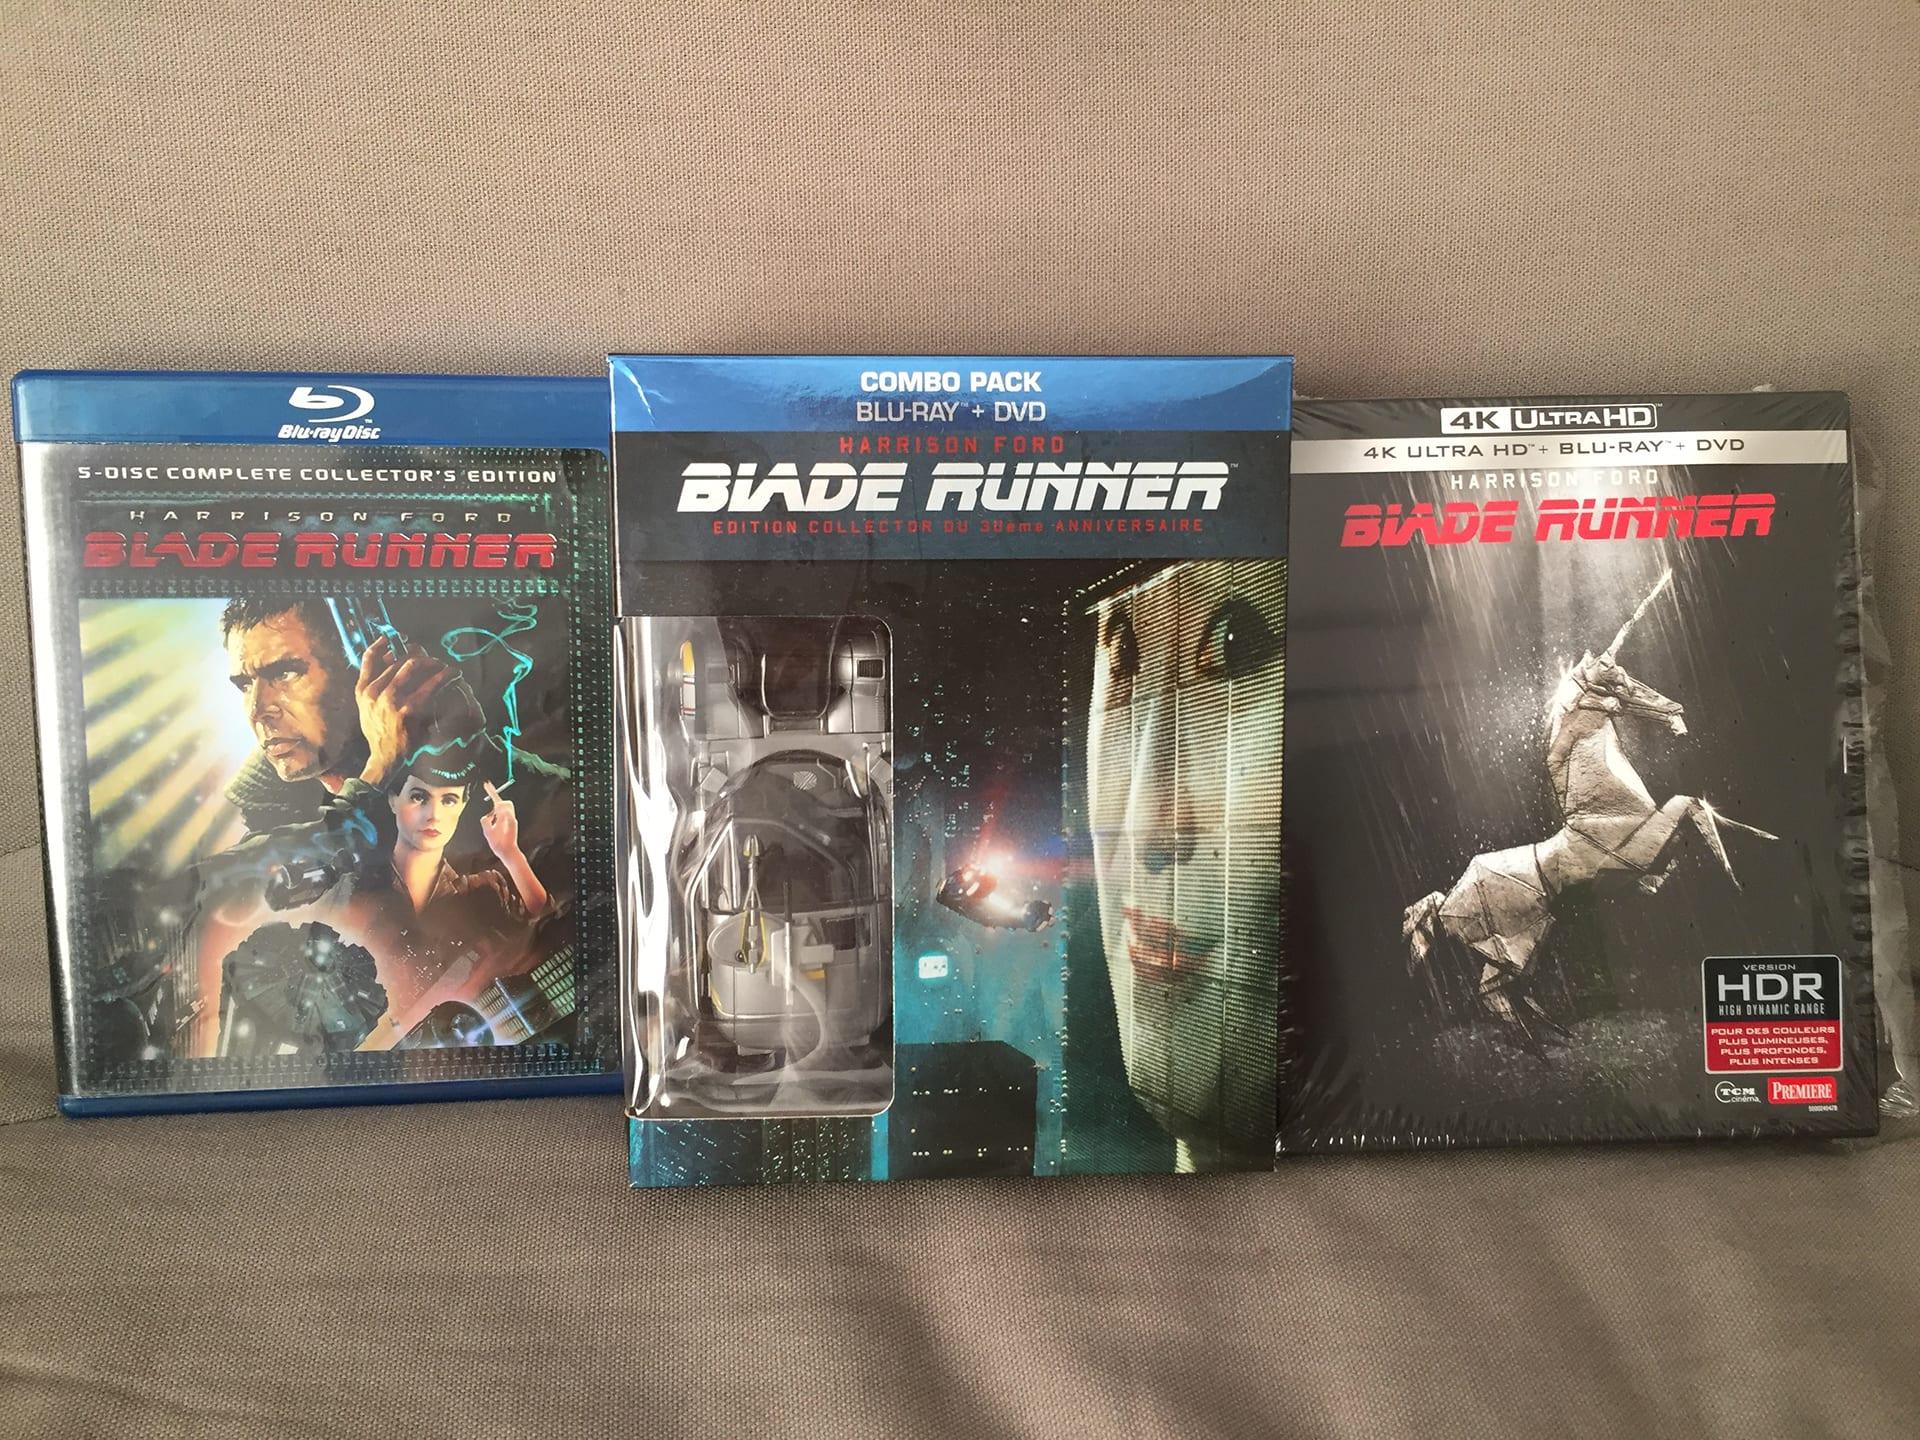 Blade Runner - Édition Blu-ray 2007, 2012, 2017